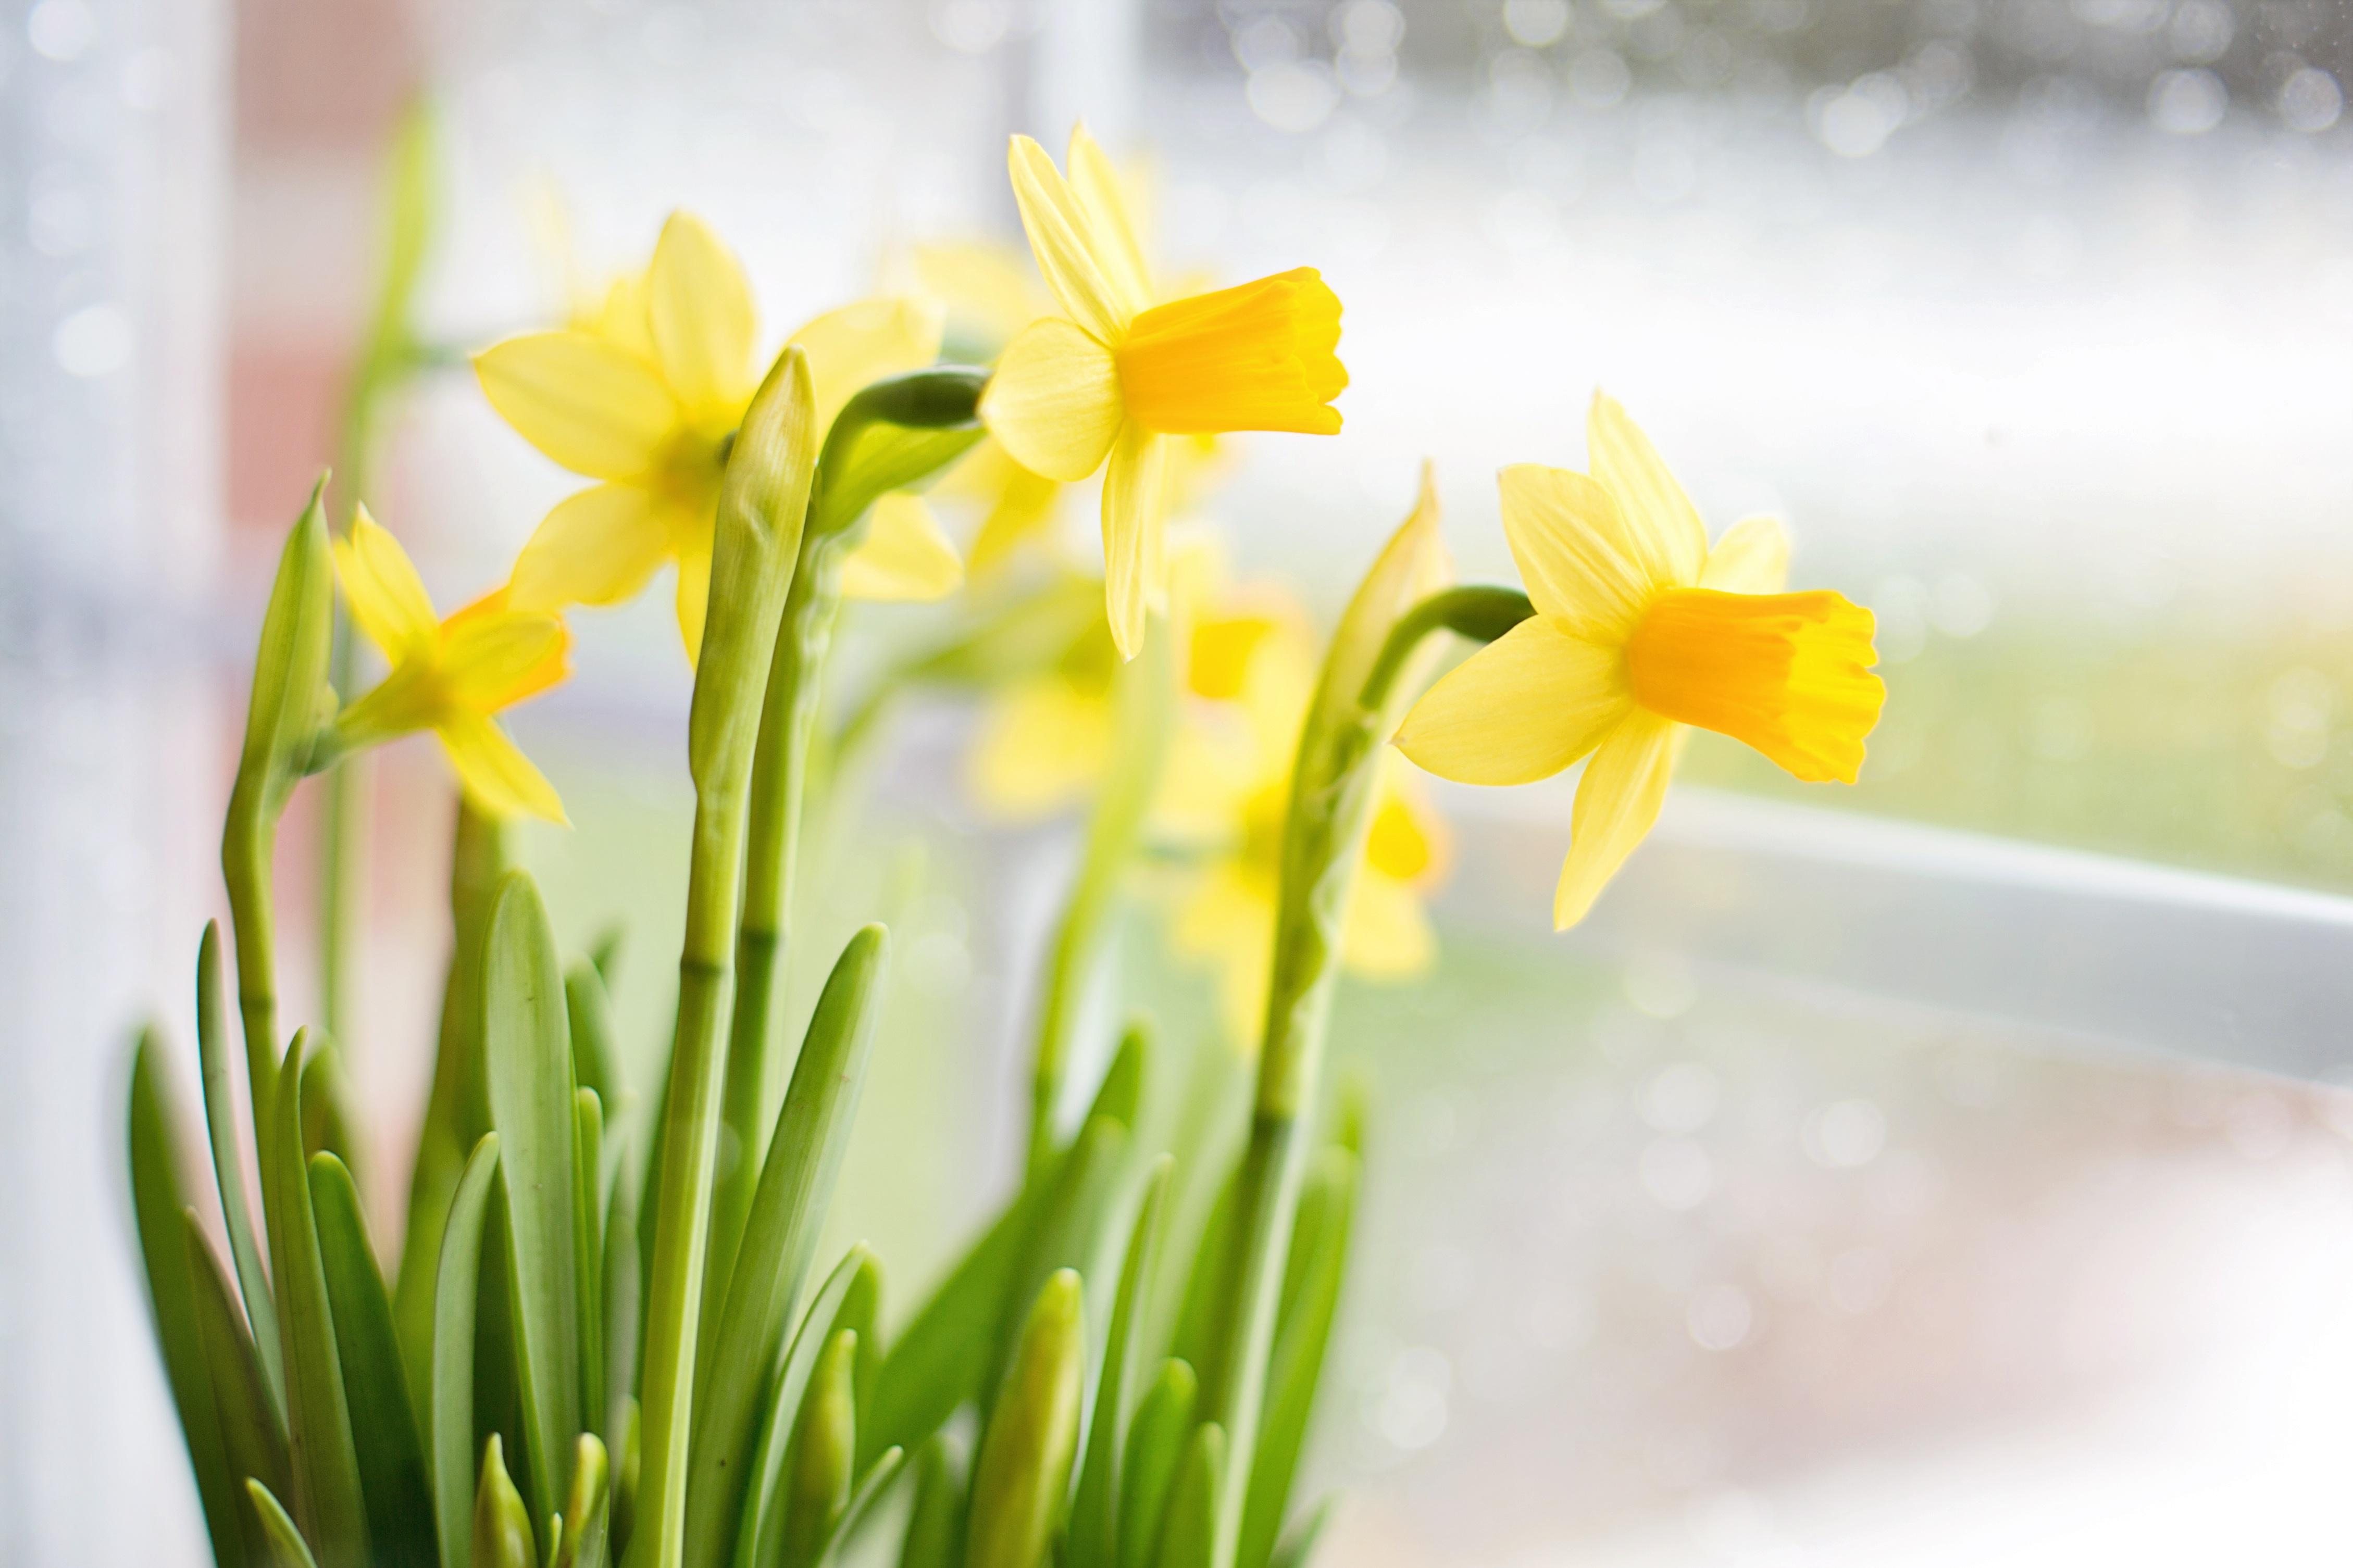 Bunch of Daffodils, Blooming, Daffodil, Flower, Fragrance, HQ Photo